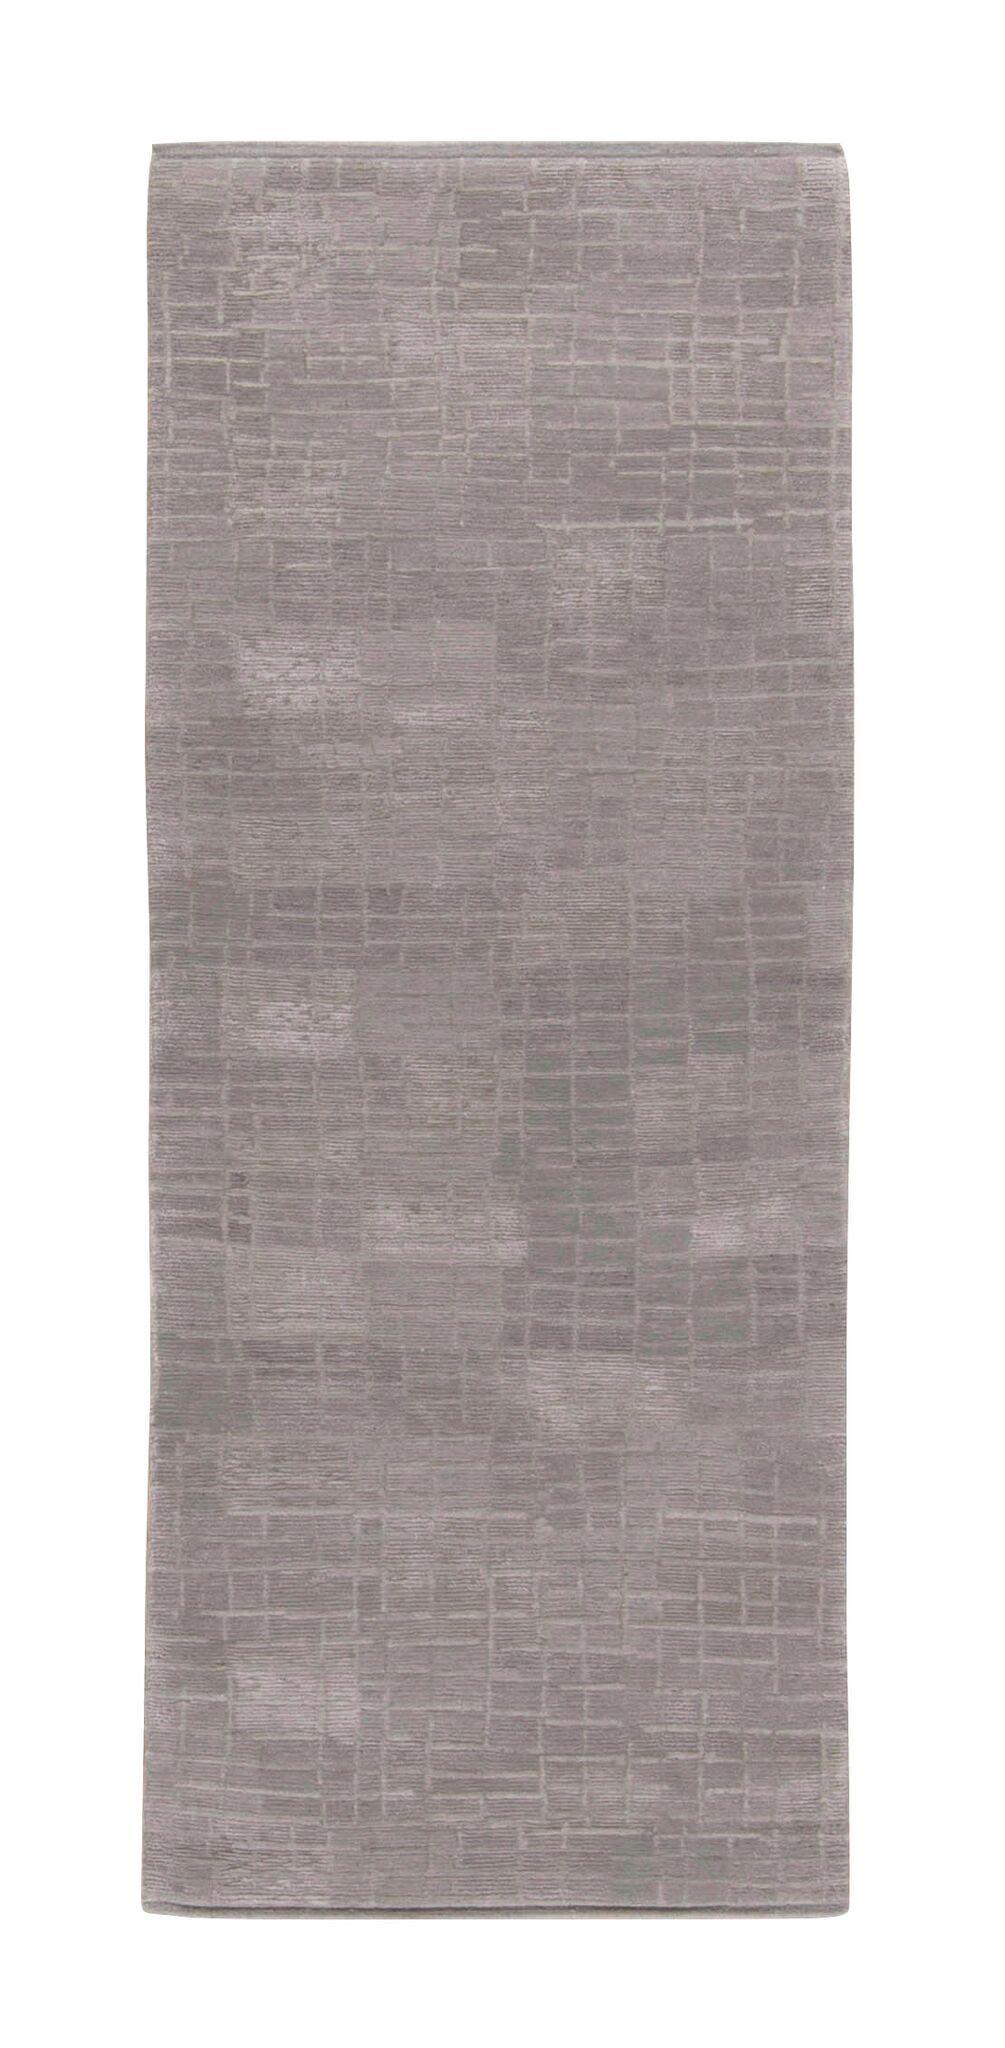 Yardo - Mosaic - 1811_preview.jpeg